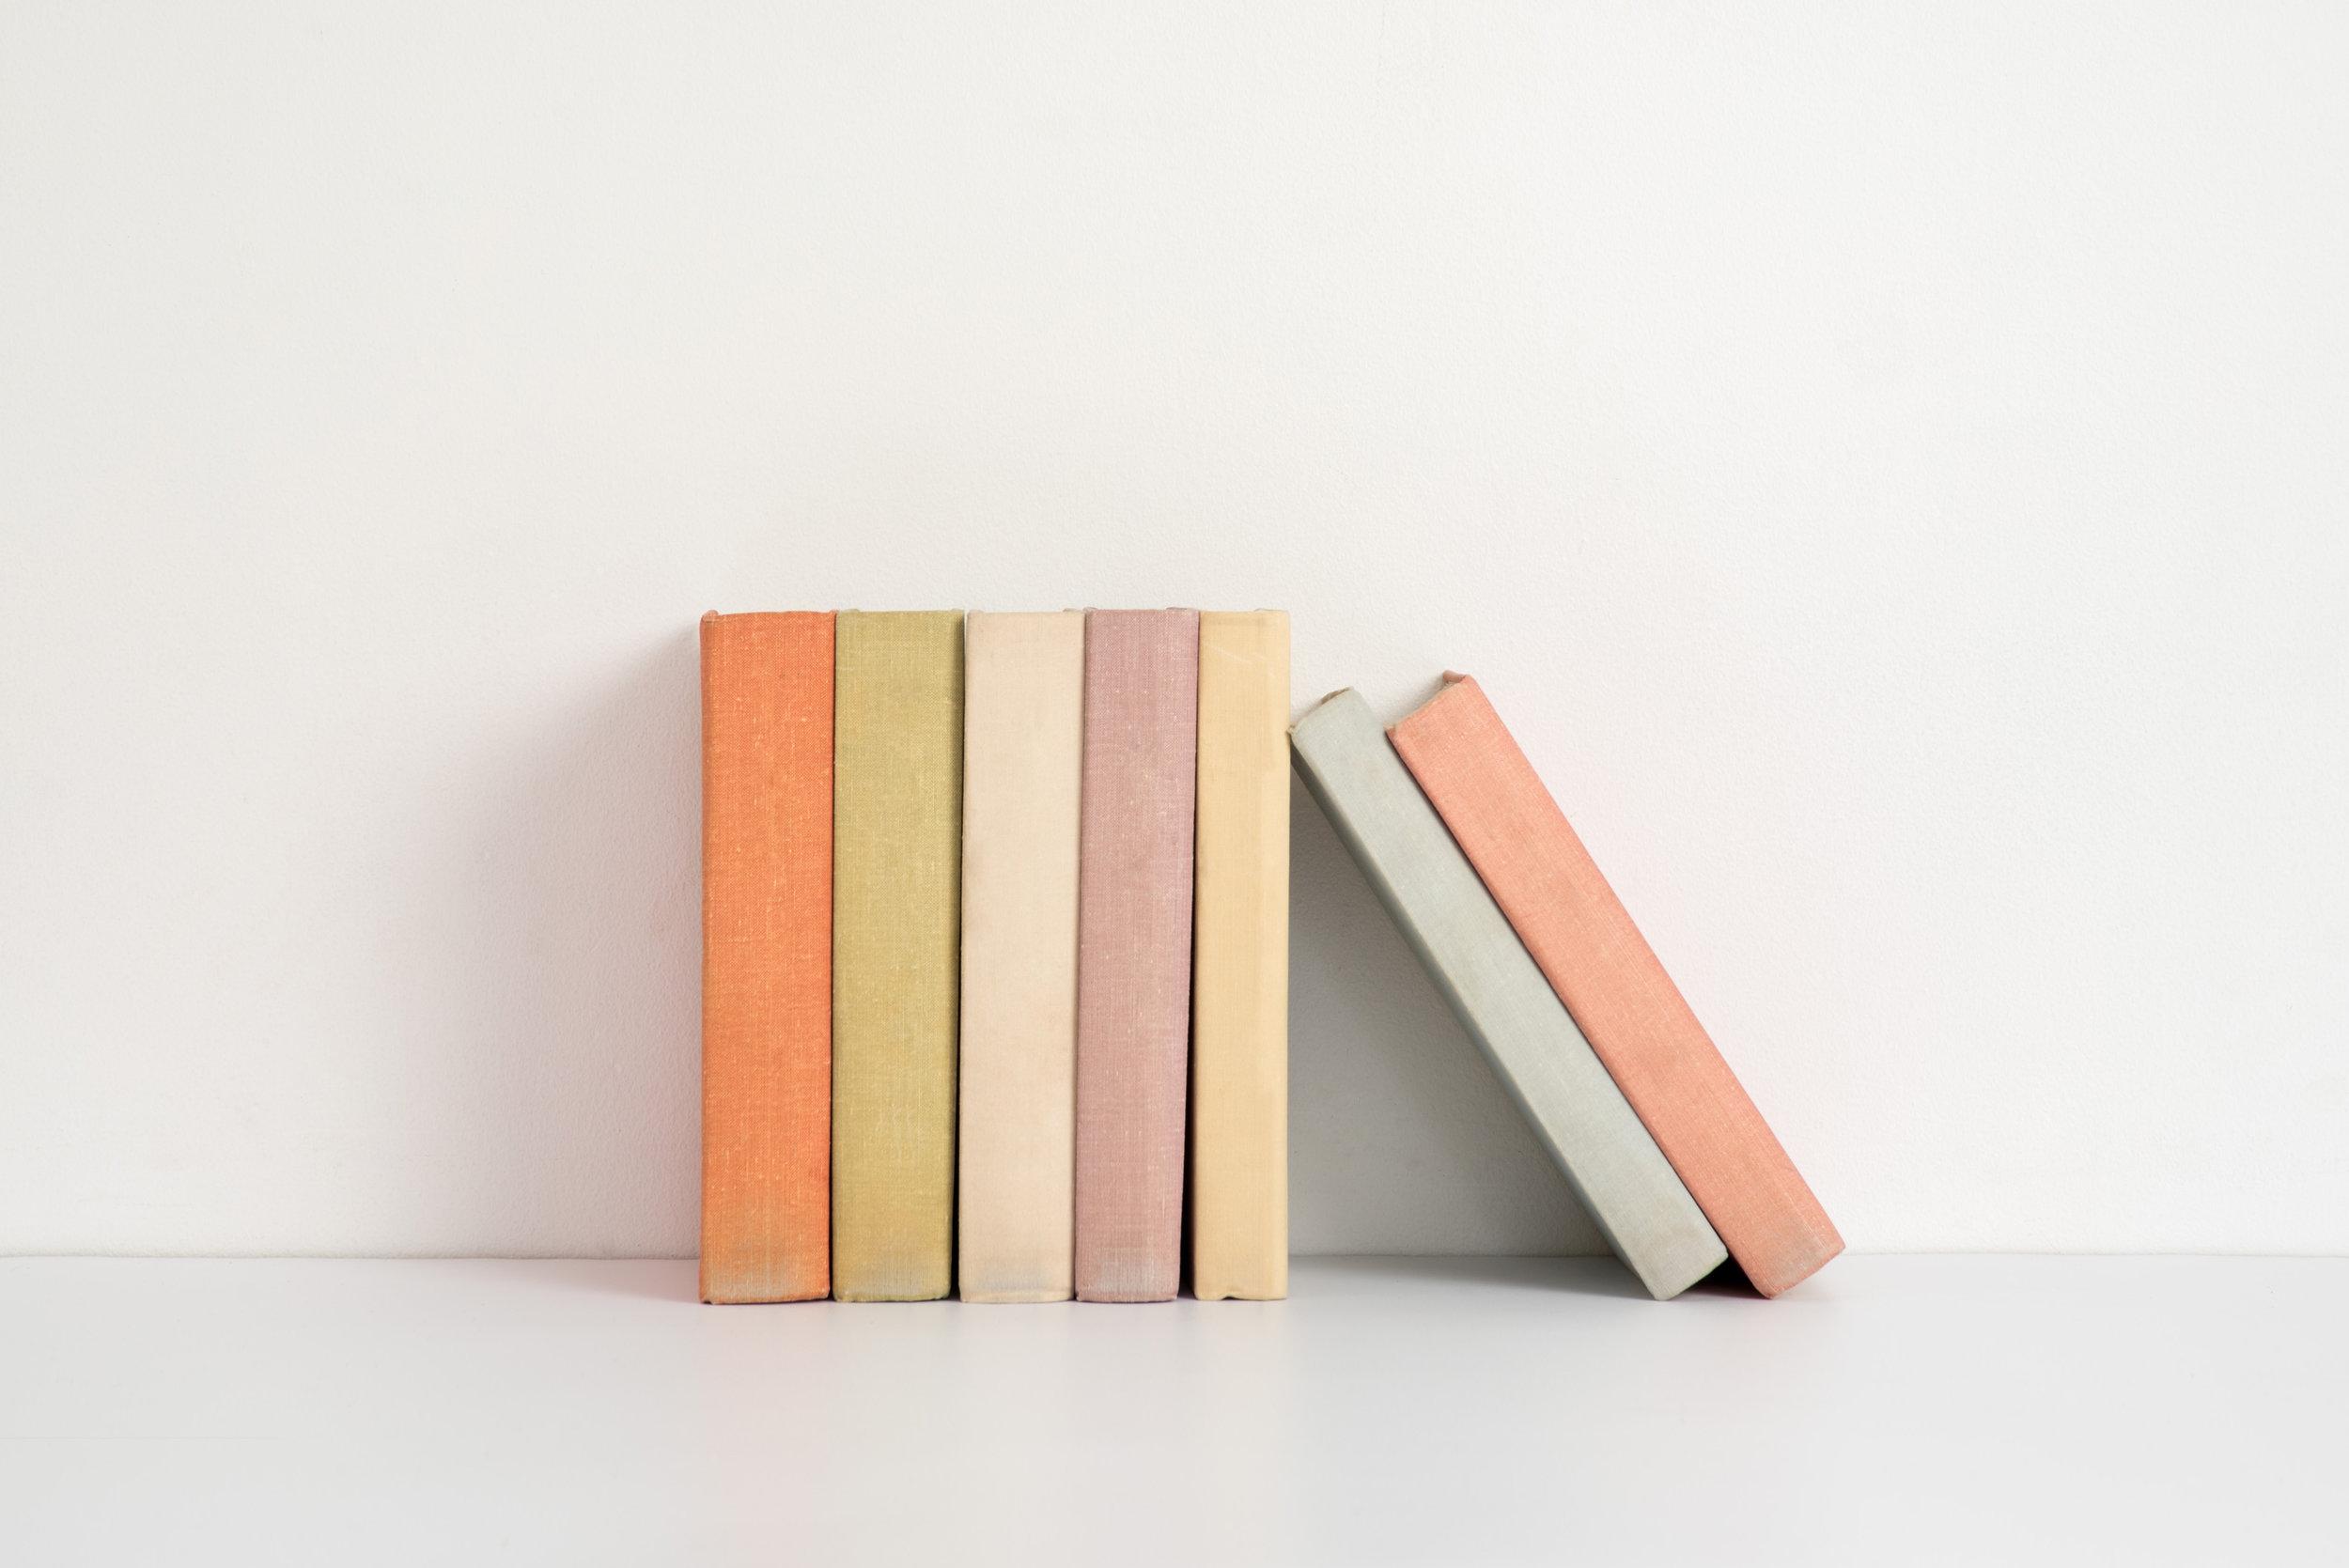 colorful-hardback-books-on-the-shelf.jpg